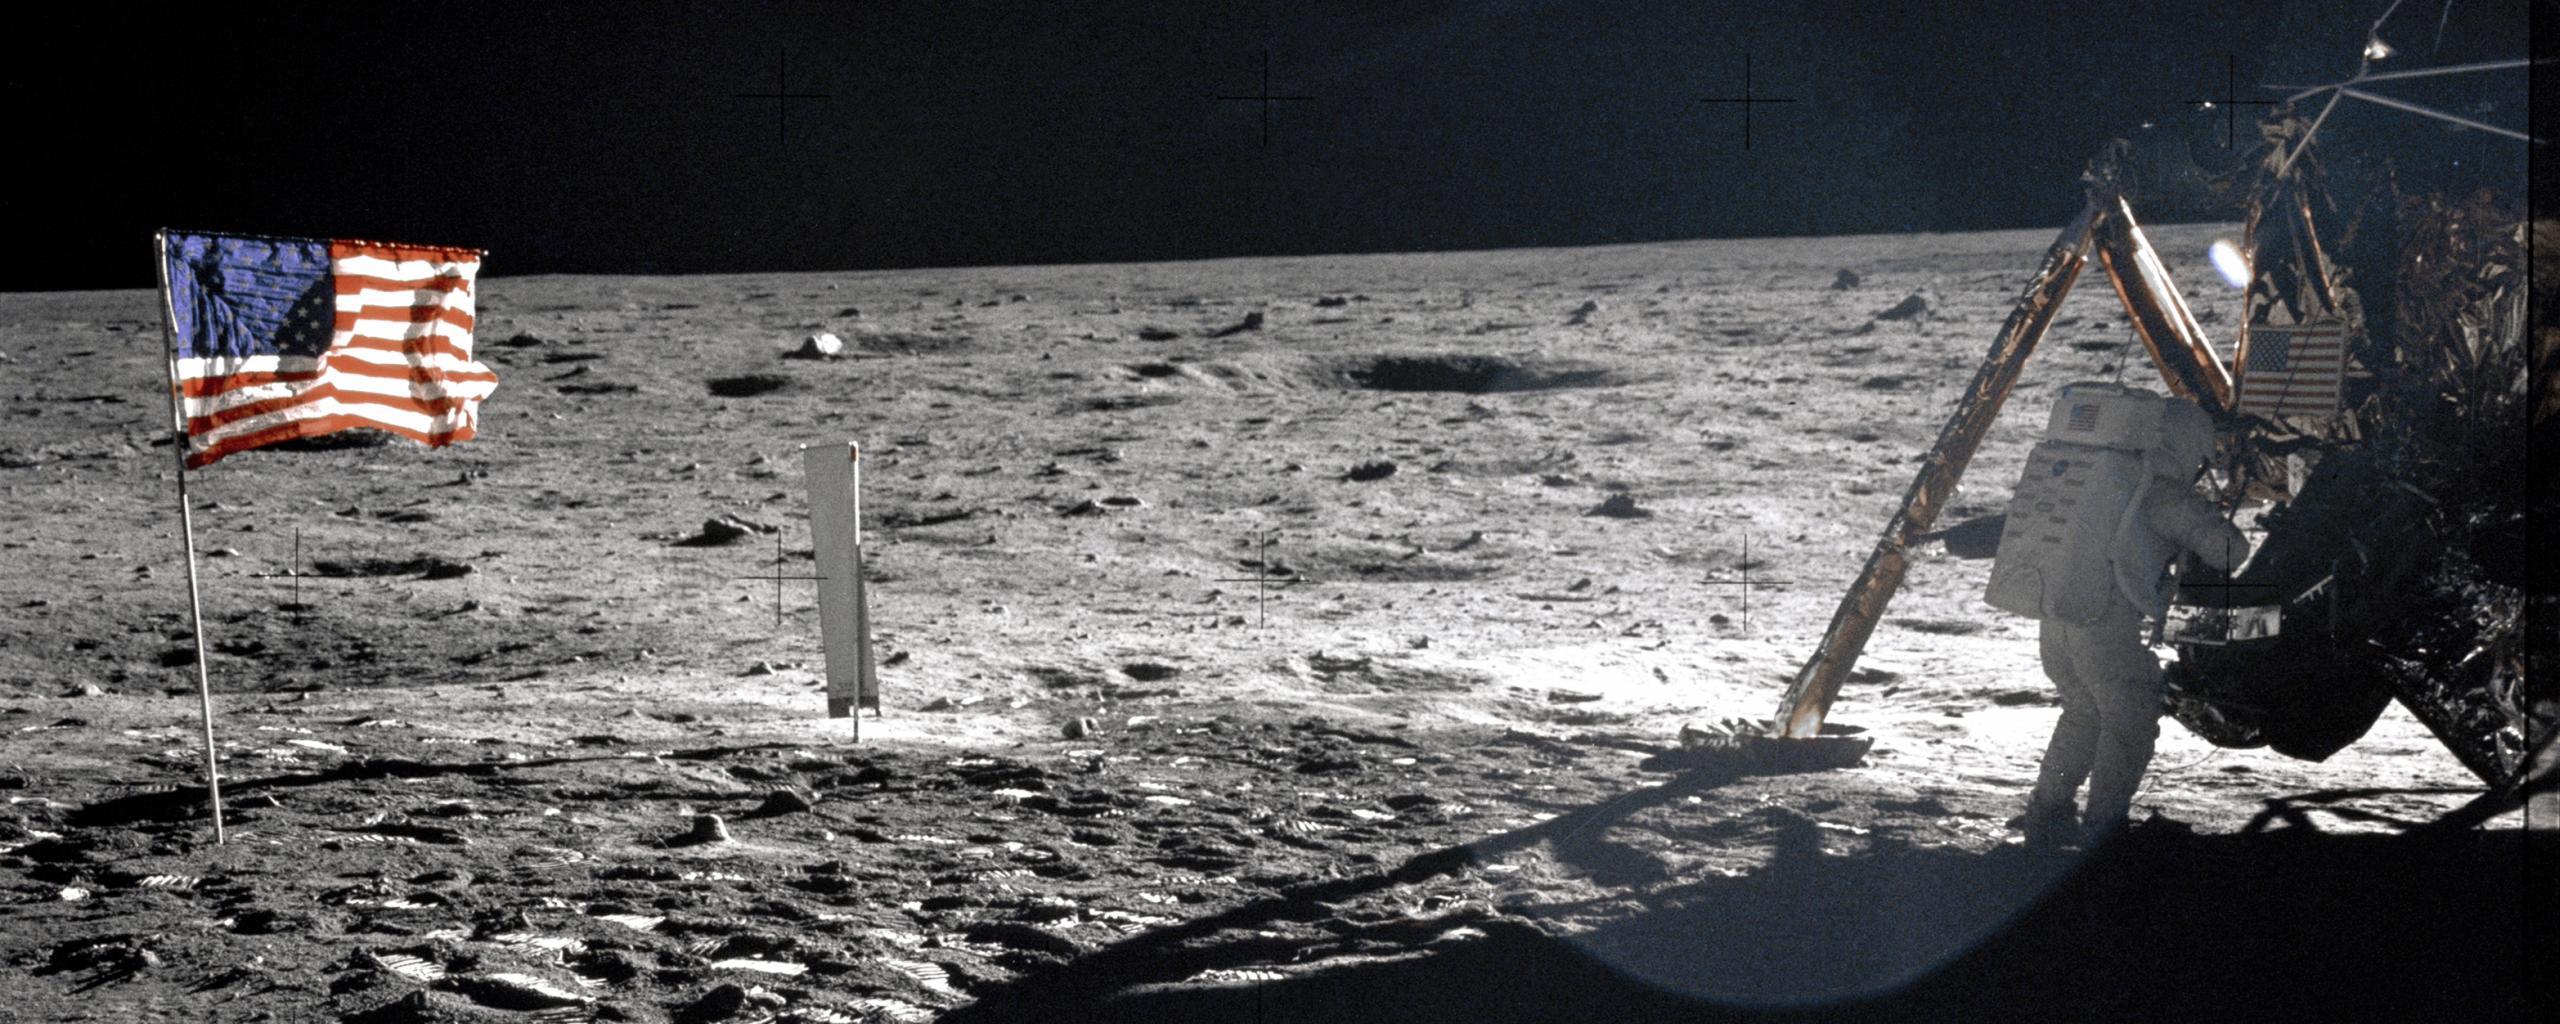 Armstrong.jpg (2560×1024)